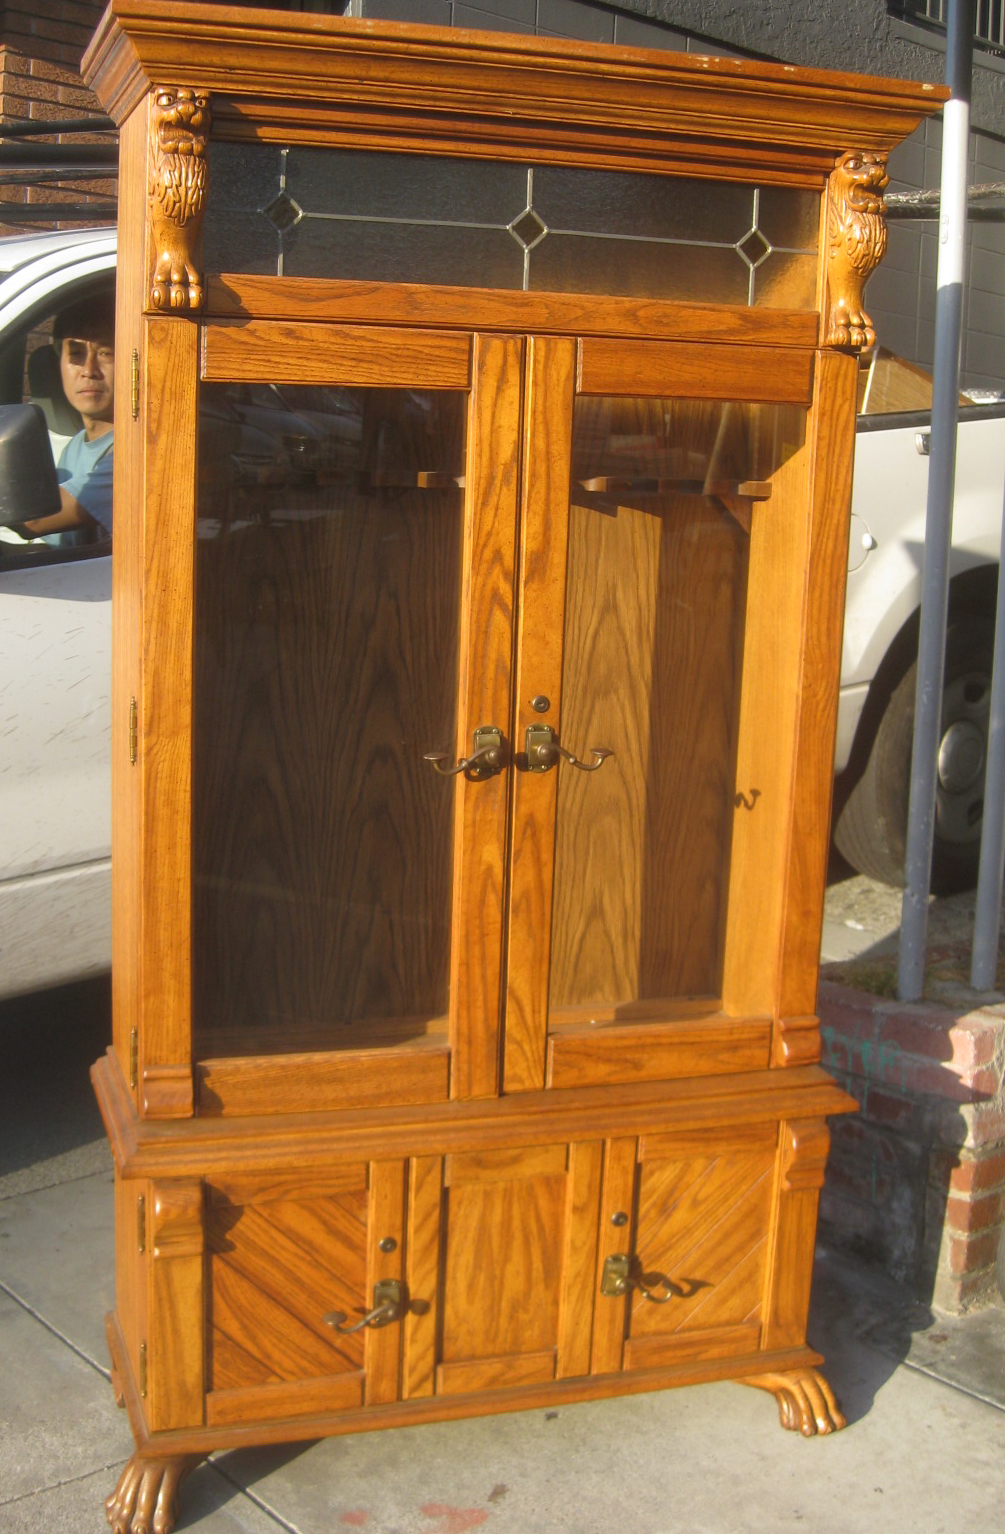 UHURU FURNITURE & COLLECTIBLES: SOLD - Oak Gun Cabinet - $95